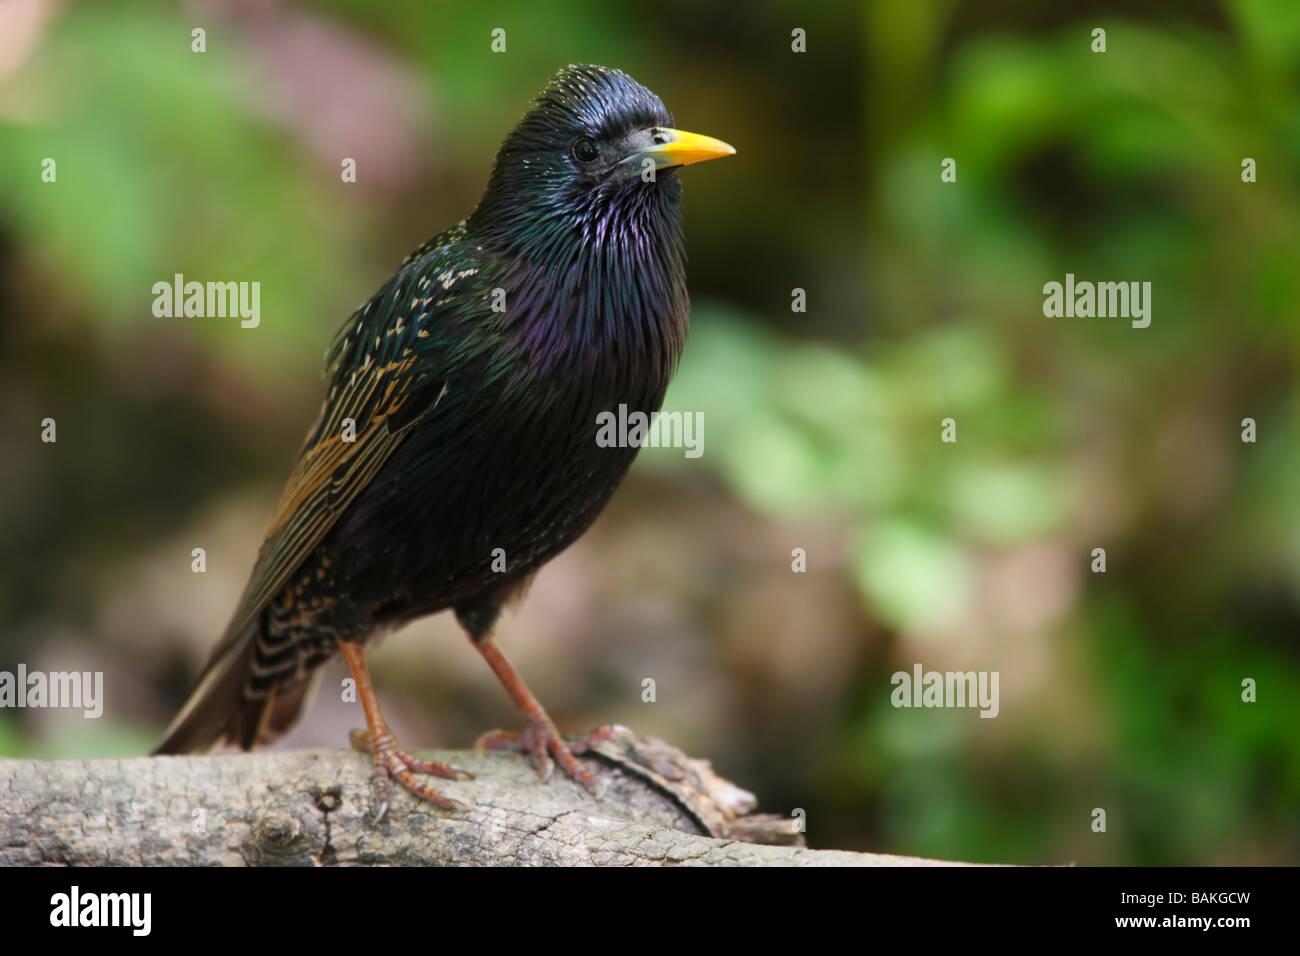 European Starling Sturnus vulgaris vulgaris male in breeding plumage - Stock Image